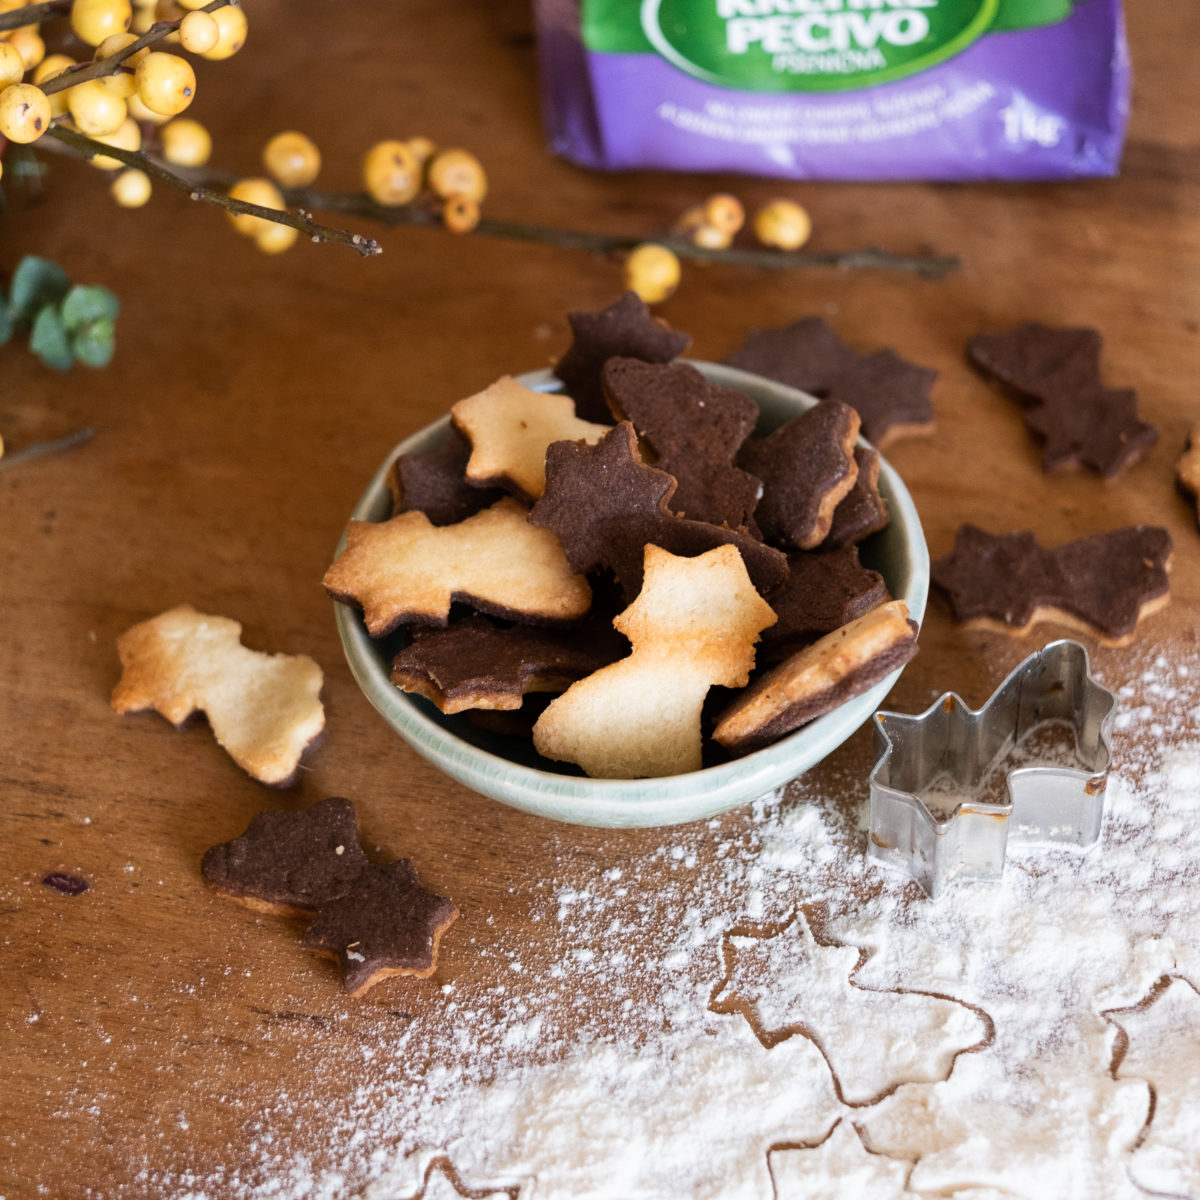 Dvoubarevné sušenky